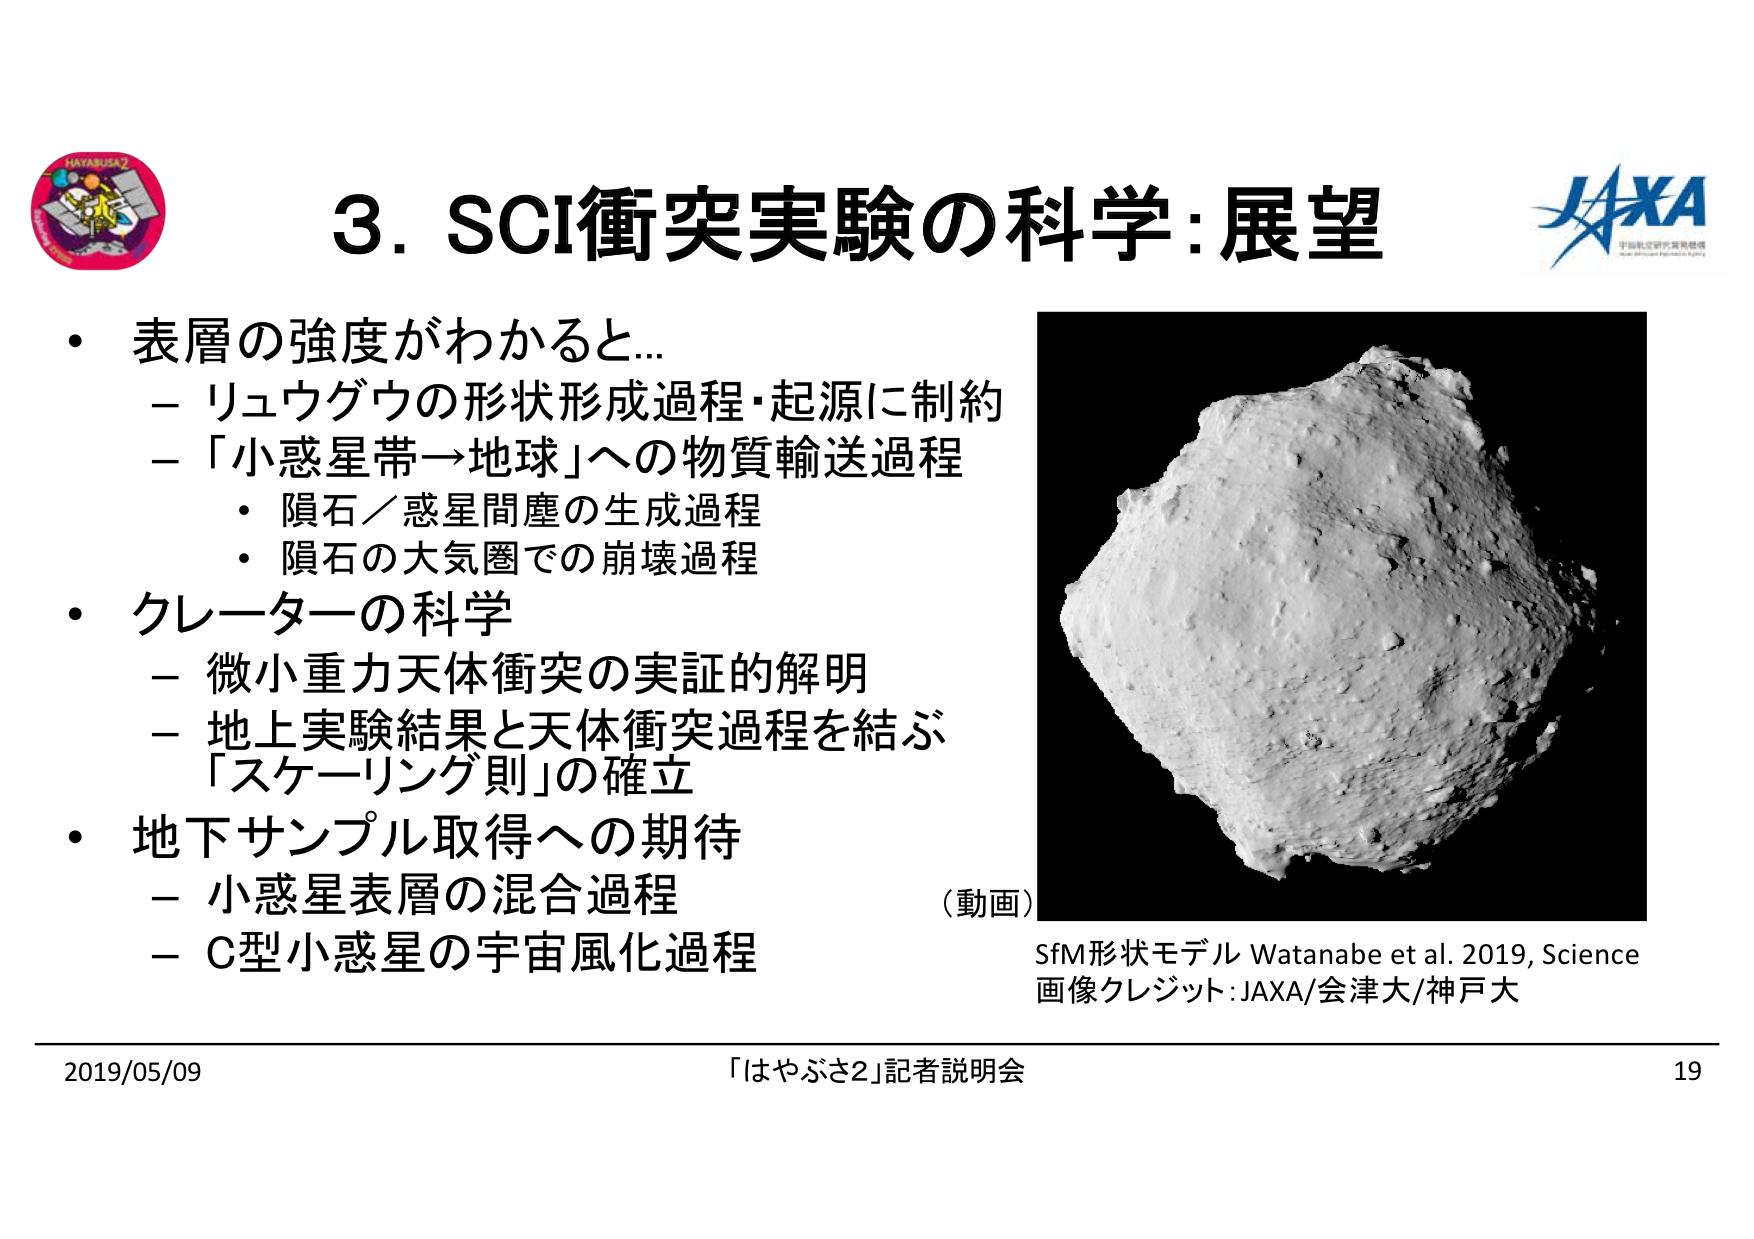 f:id:Imamura:20190509154415p:plain